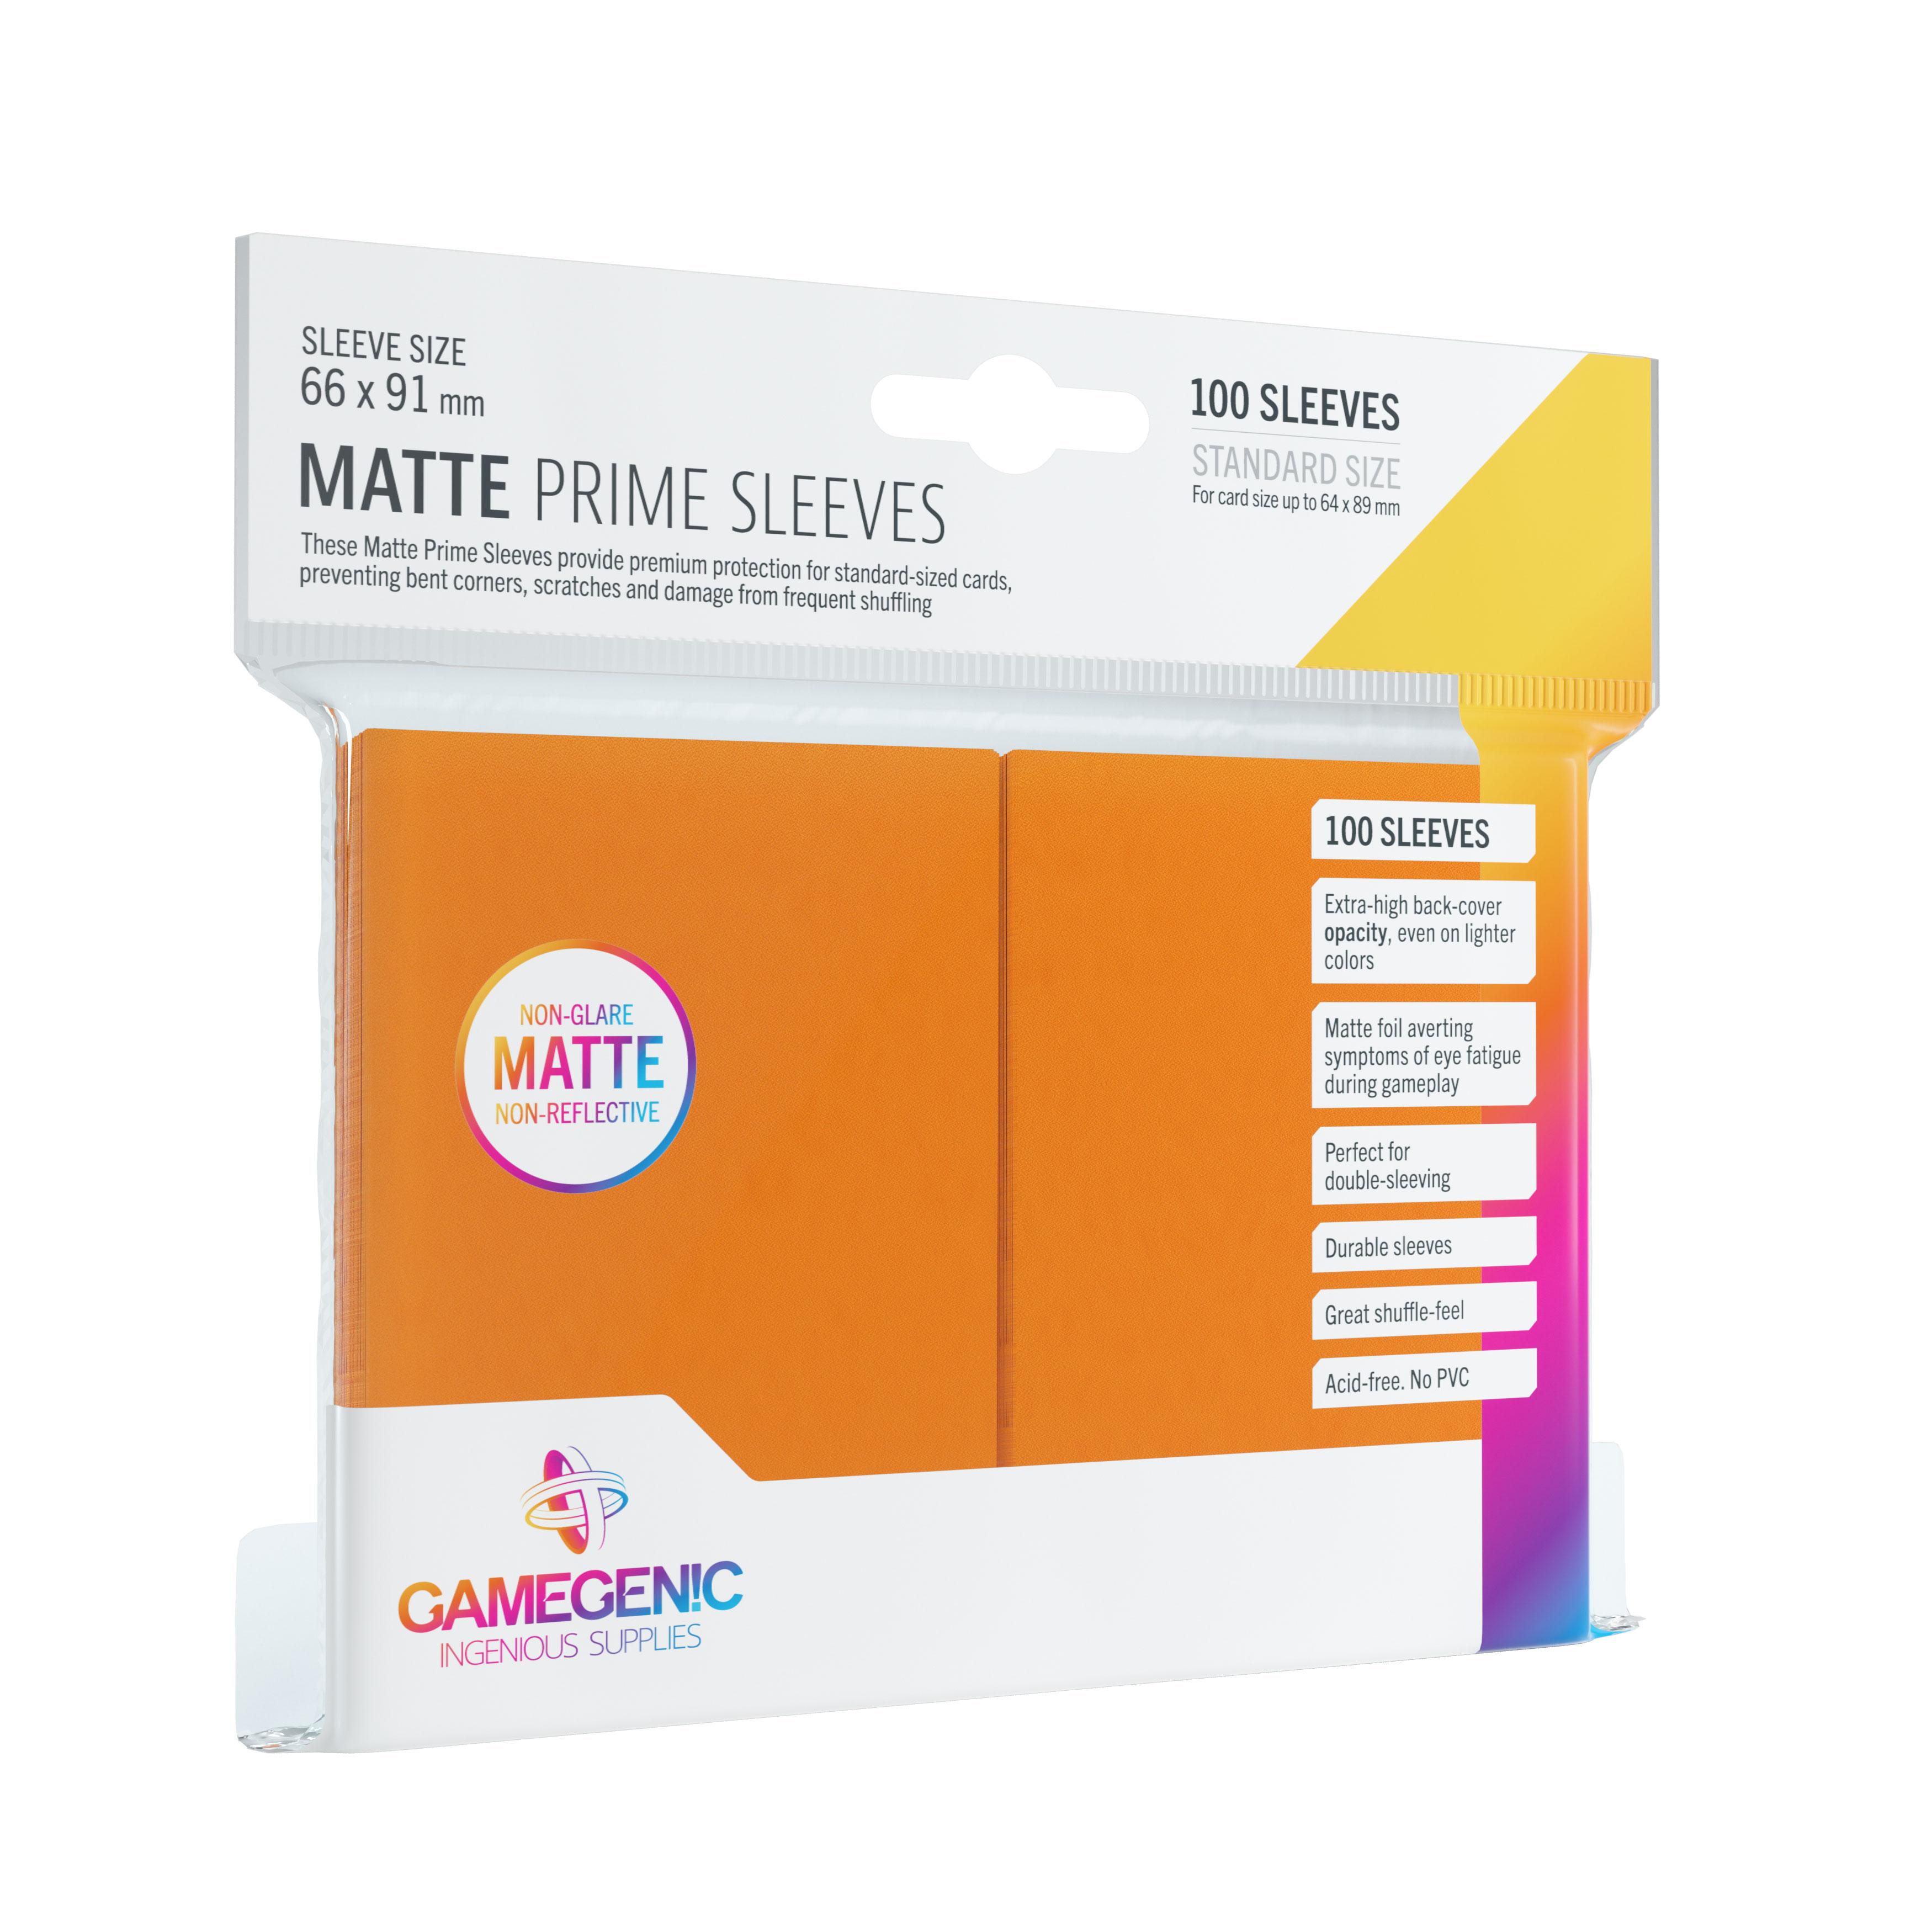 Gamegenic: Matte Prime CCG Sleeves (66x91 mm) - Orange, 100 sztuk